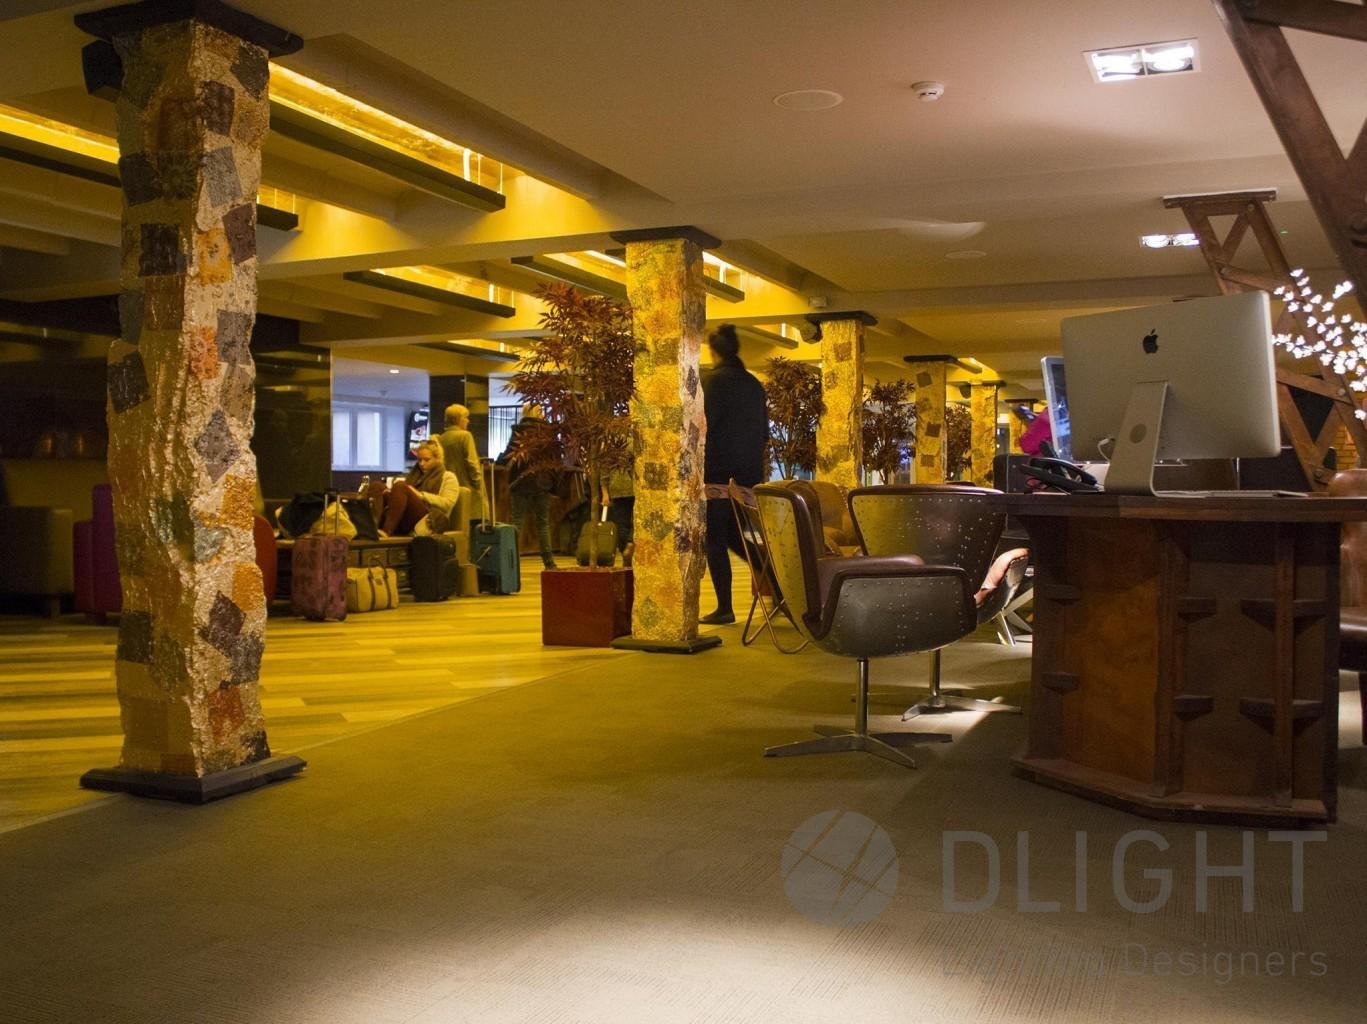 temple bar inn dublin 2 dlight. Black Bedroom Furniture Sets. Home Design Ideas